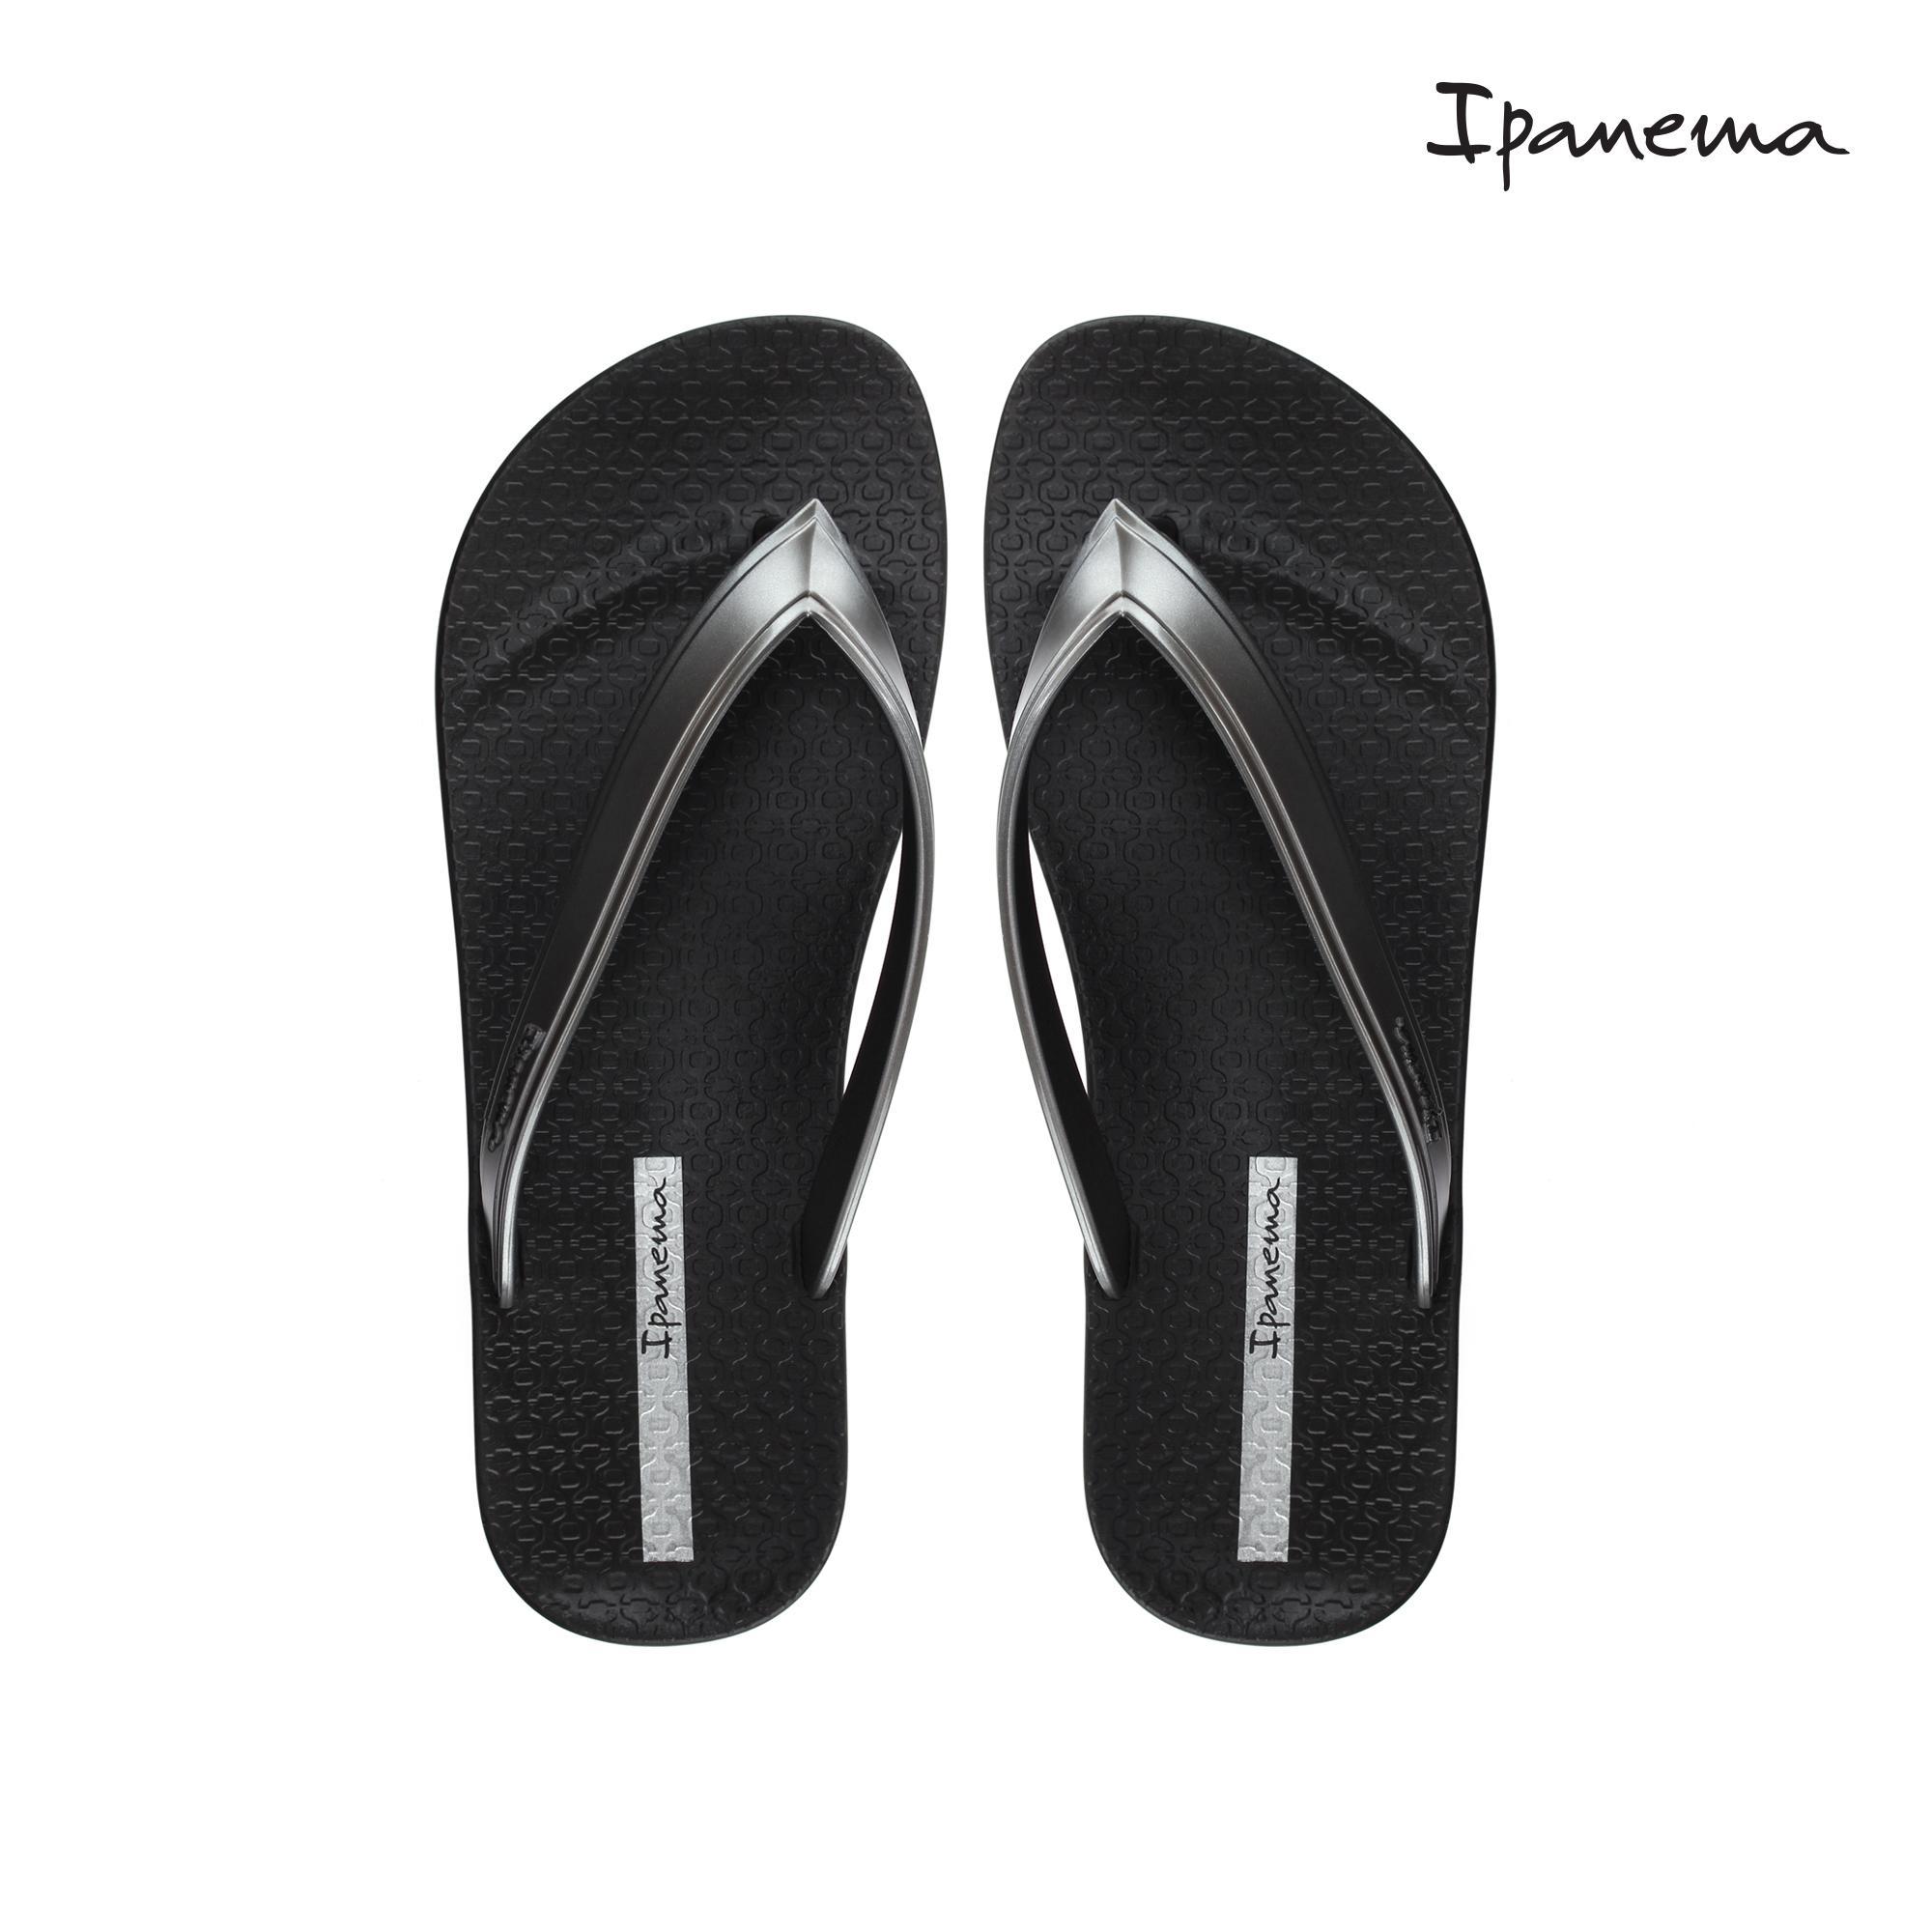 444bfa8606f562 Ipanema Philippines  Ipanema price list - Ipanema Flip Flop ...